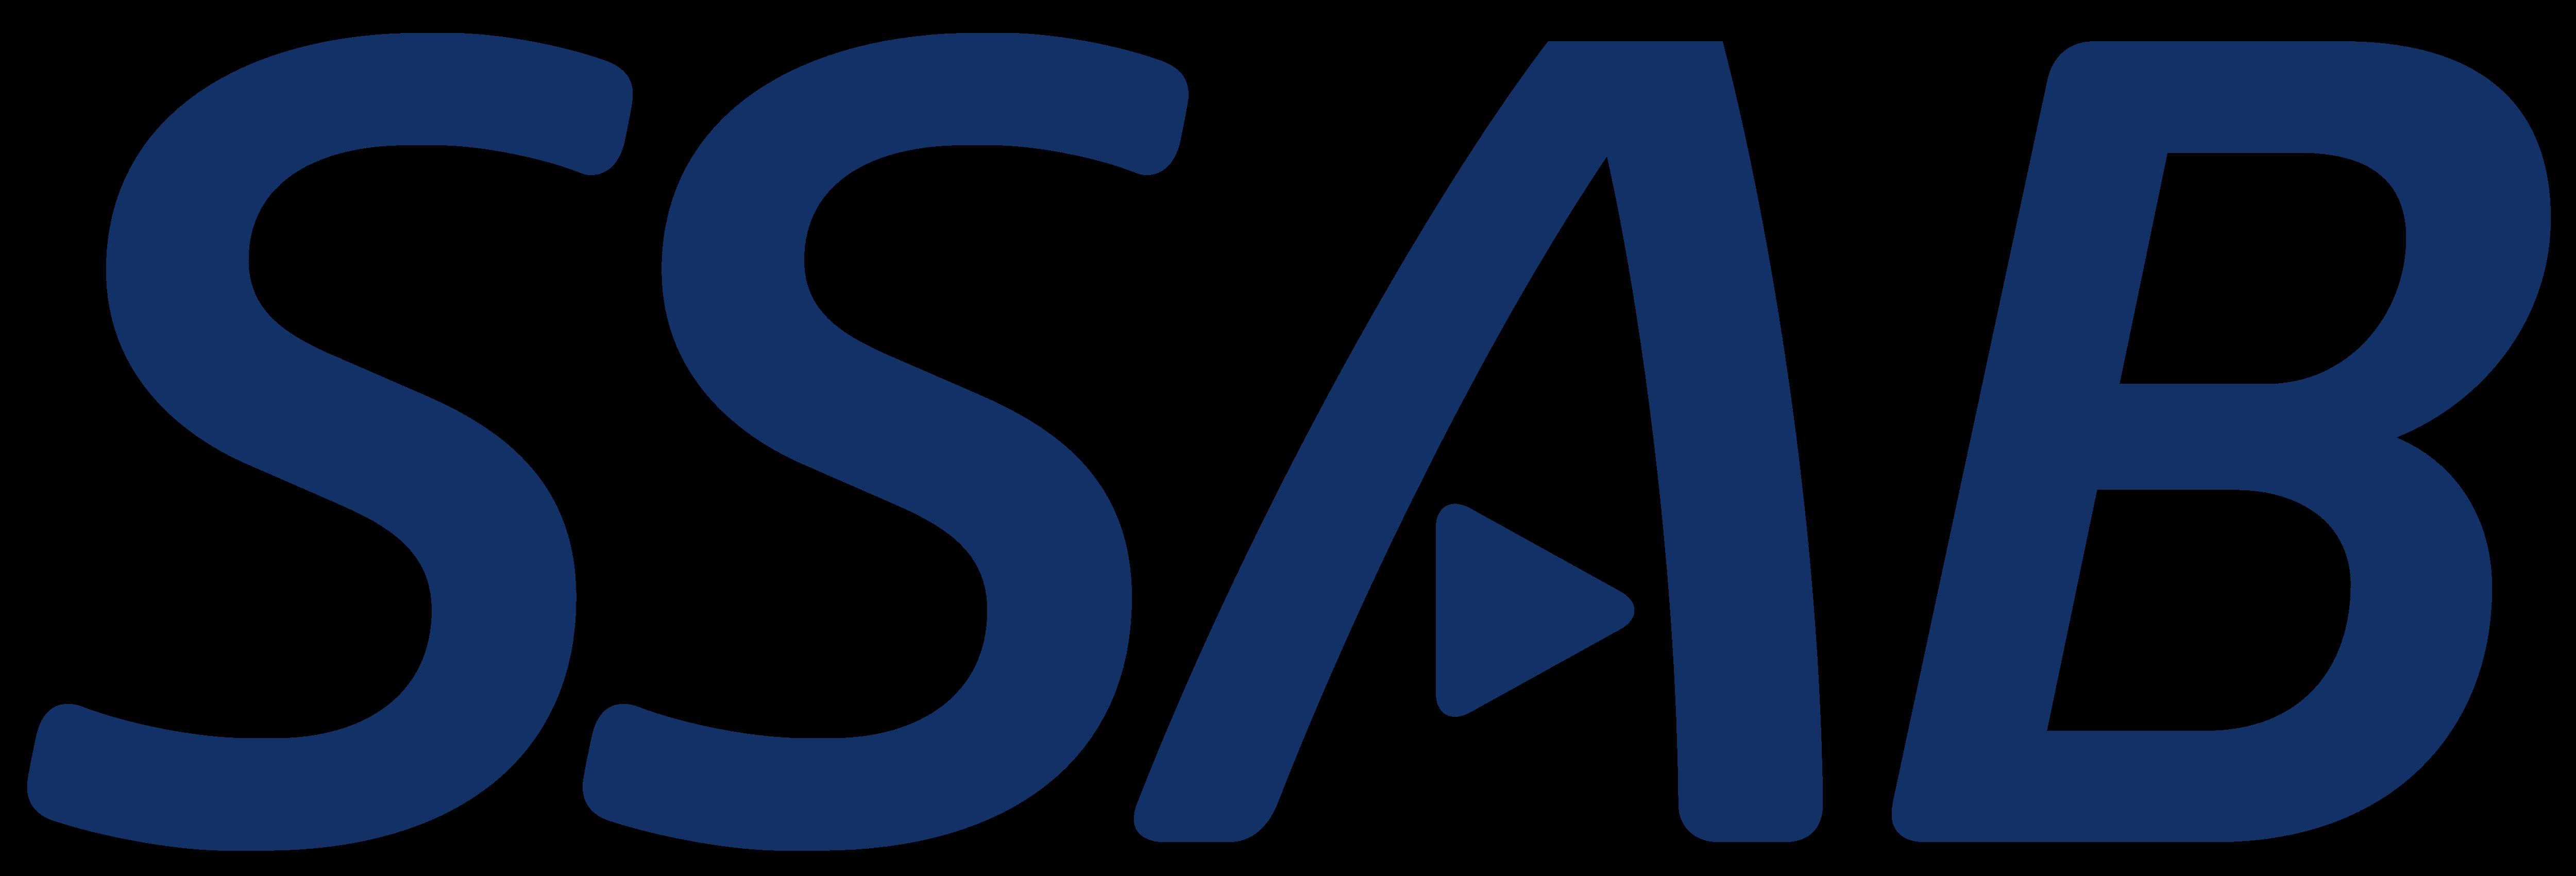 SSAB_logo